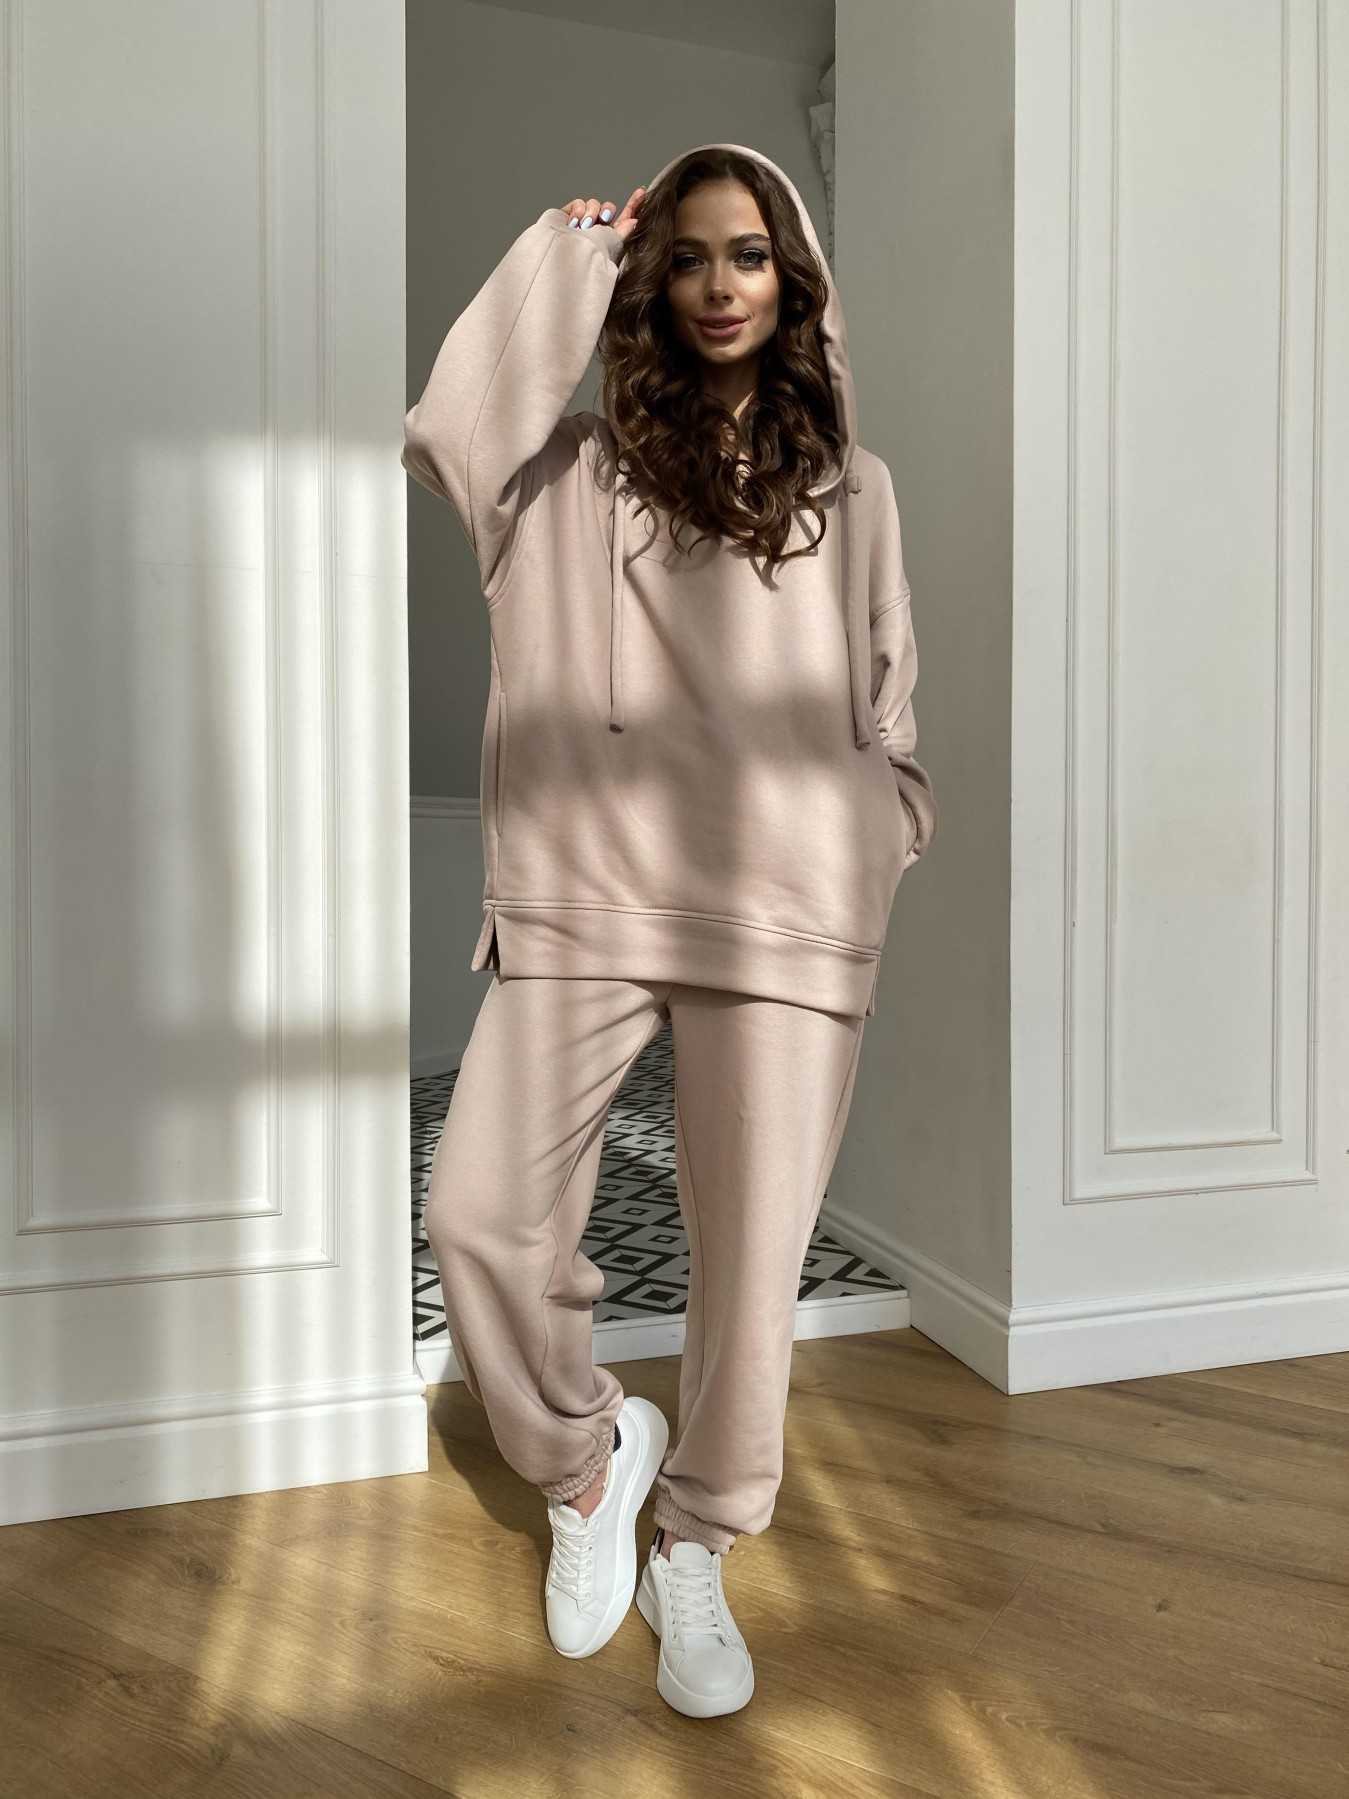 Ярис костюм из 3х нитки 10789 АРТ. 47615 Цвет: Бежевый Темный - фото 9, интернет магазин tm-modus.ru